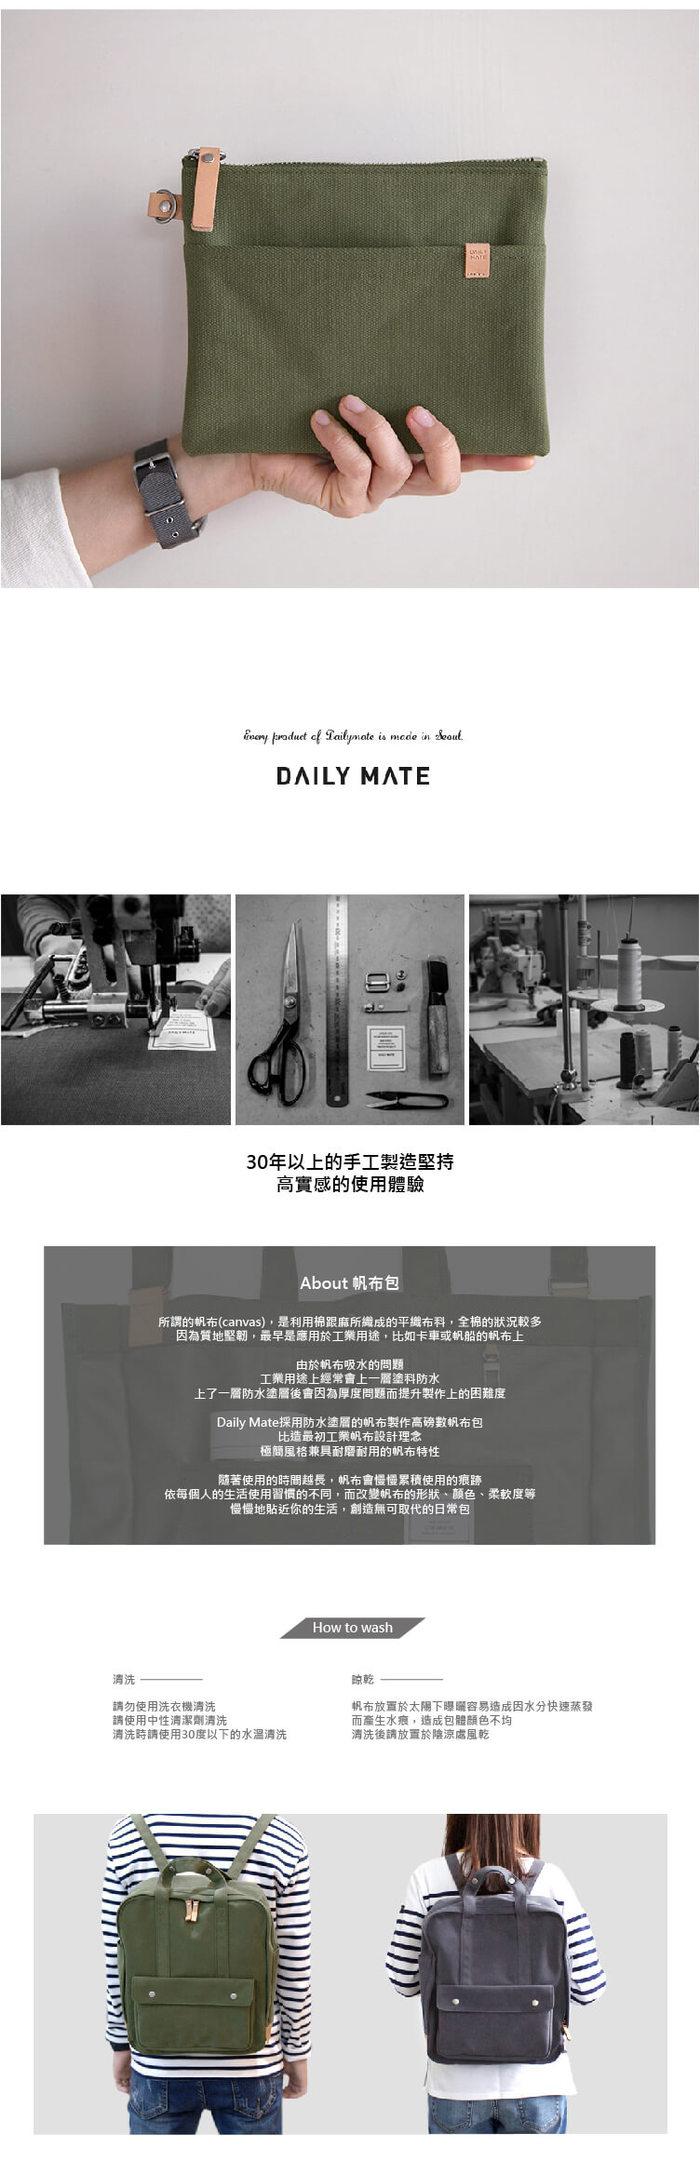 Daily mate|萬用收納袋M(軍綠)